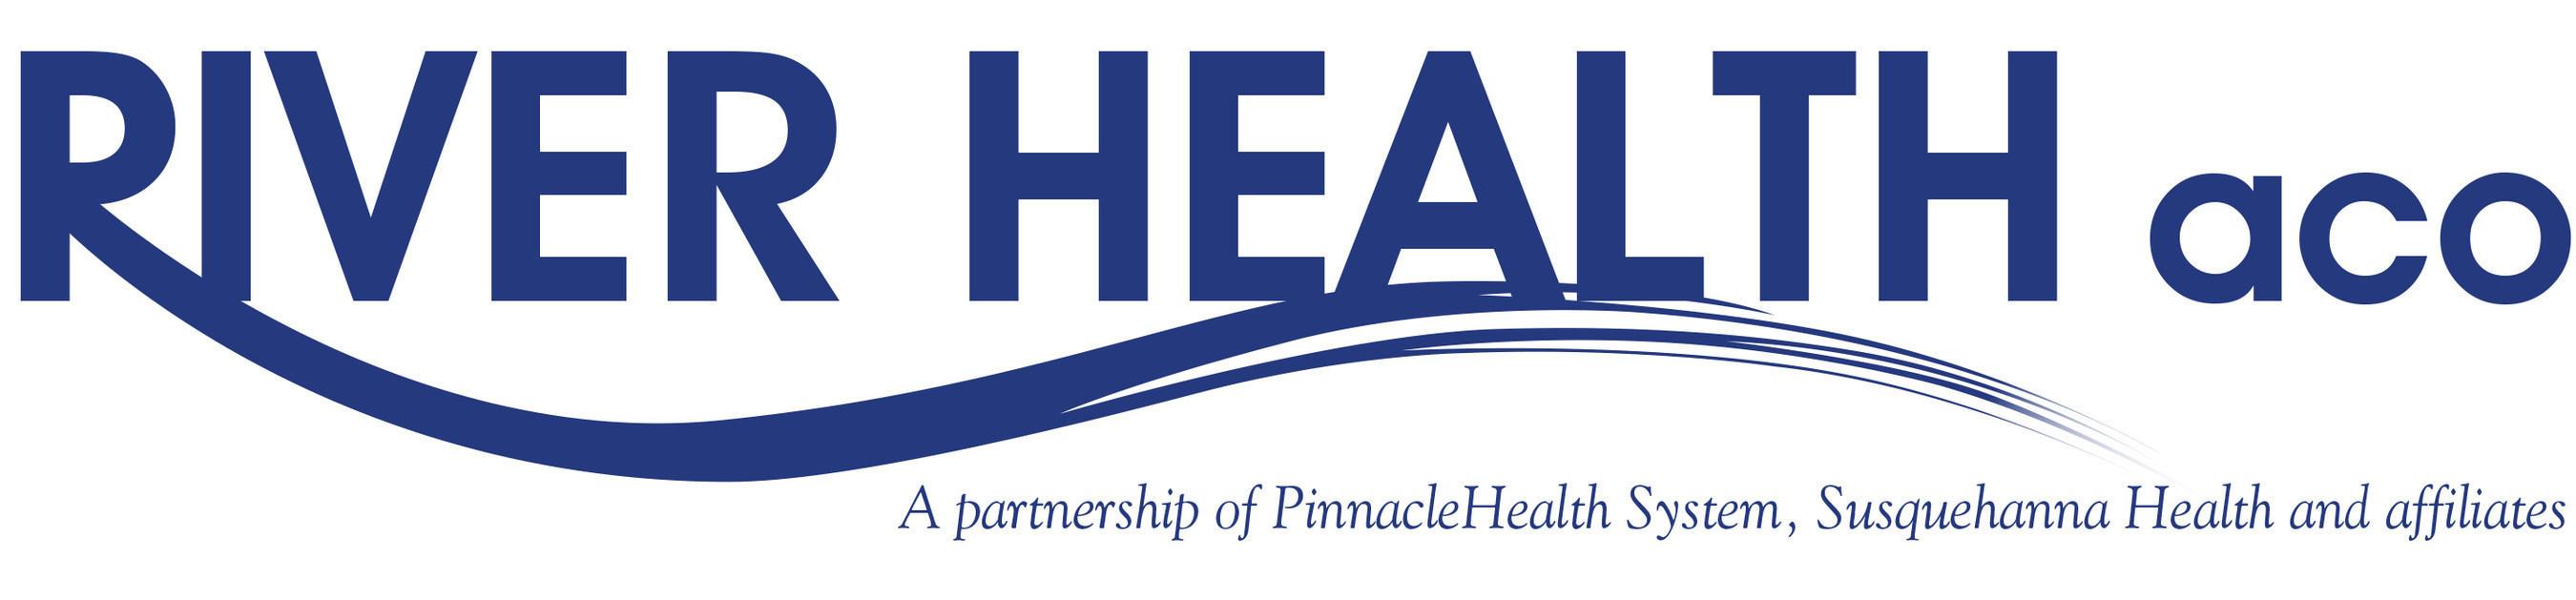 The River Health Accountable Care Organization